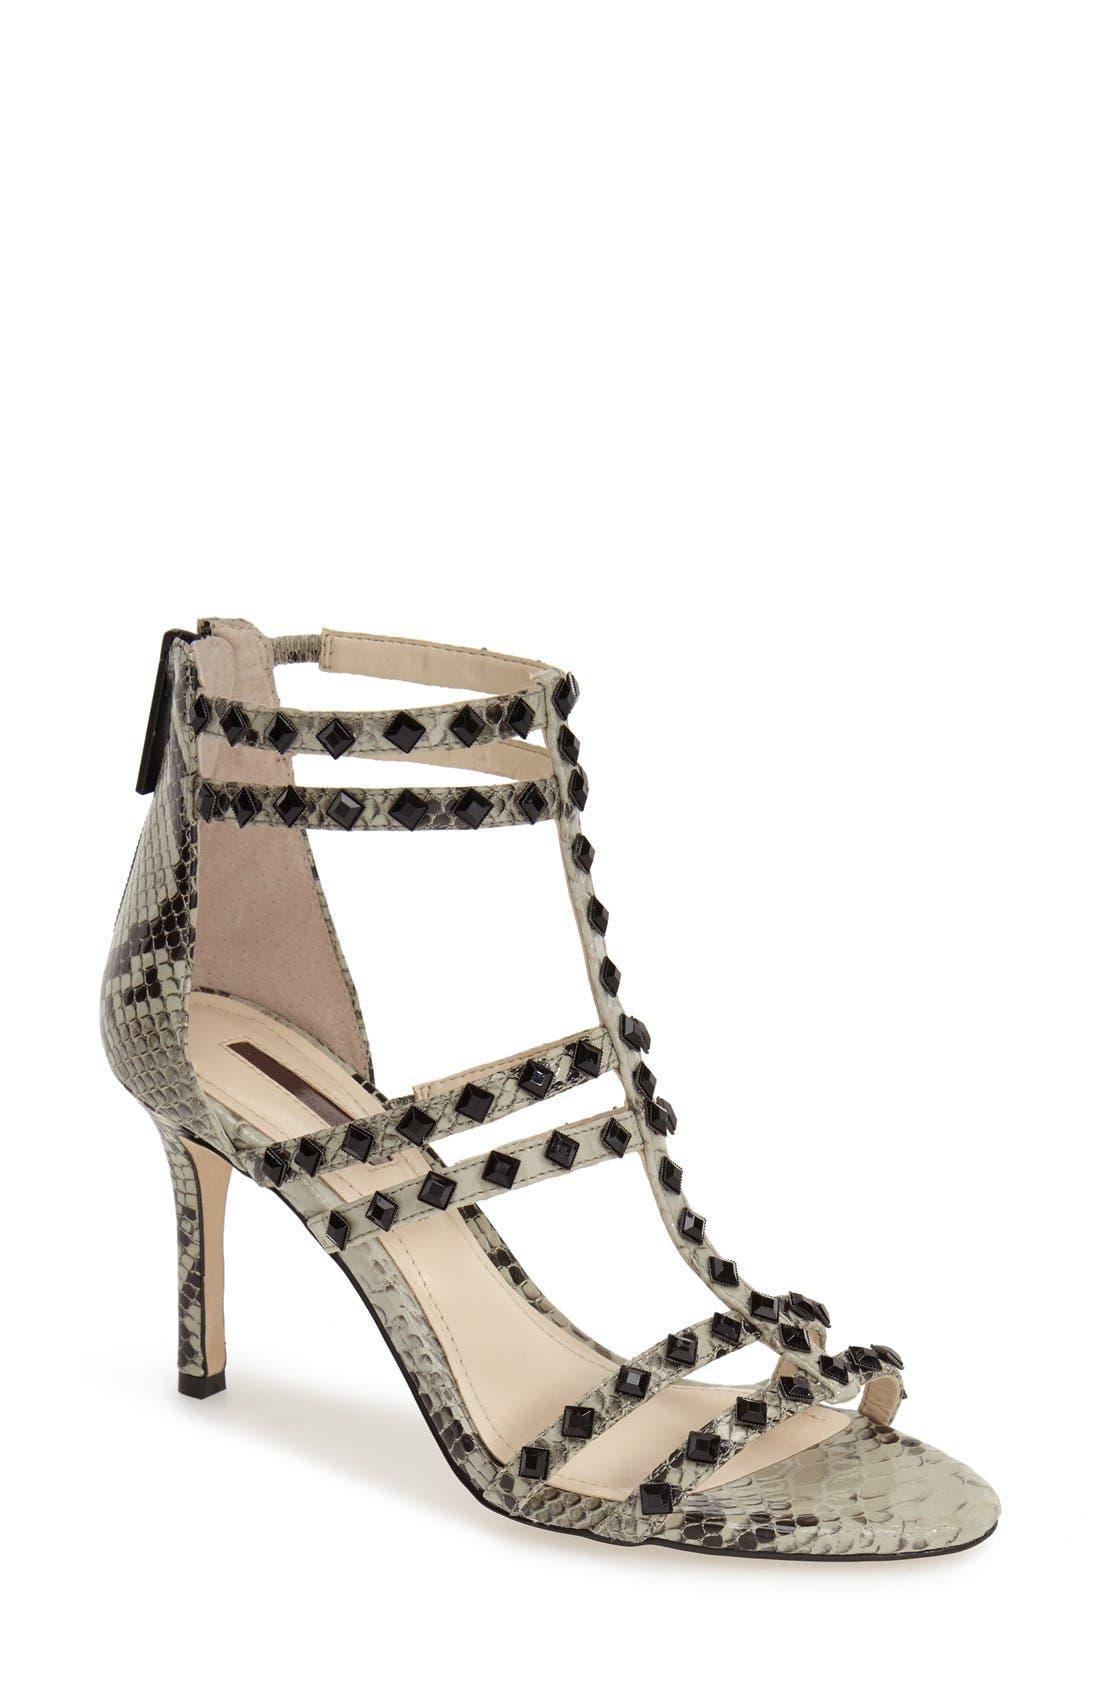 Main Image - BCBGeneration 'Dariah' Studded T-Strap Sandal (Women)